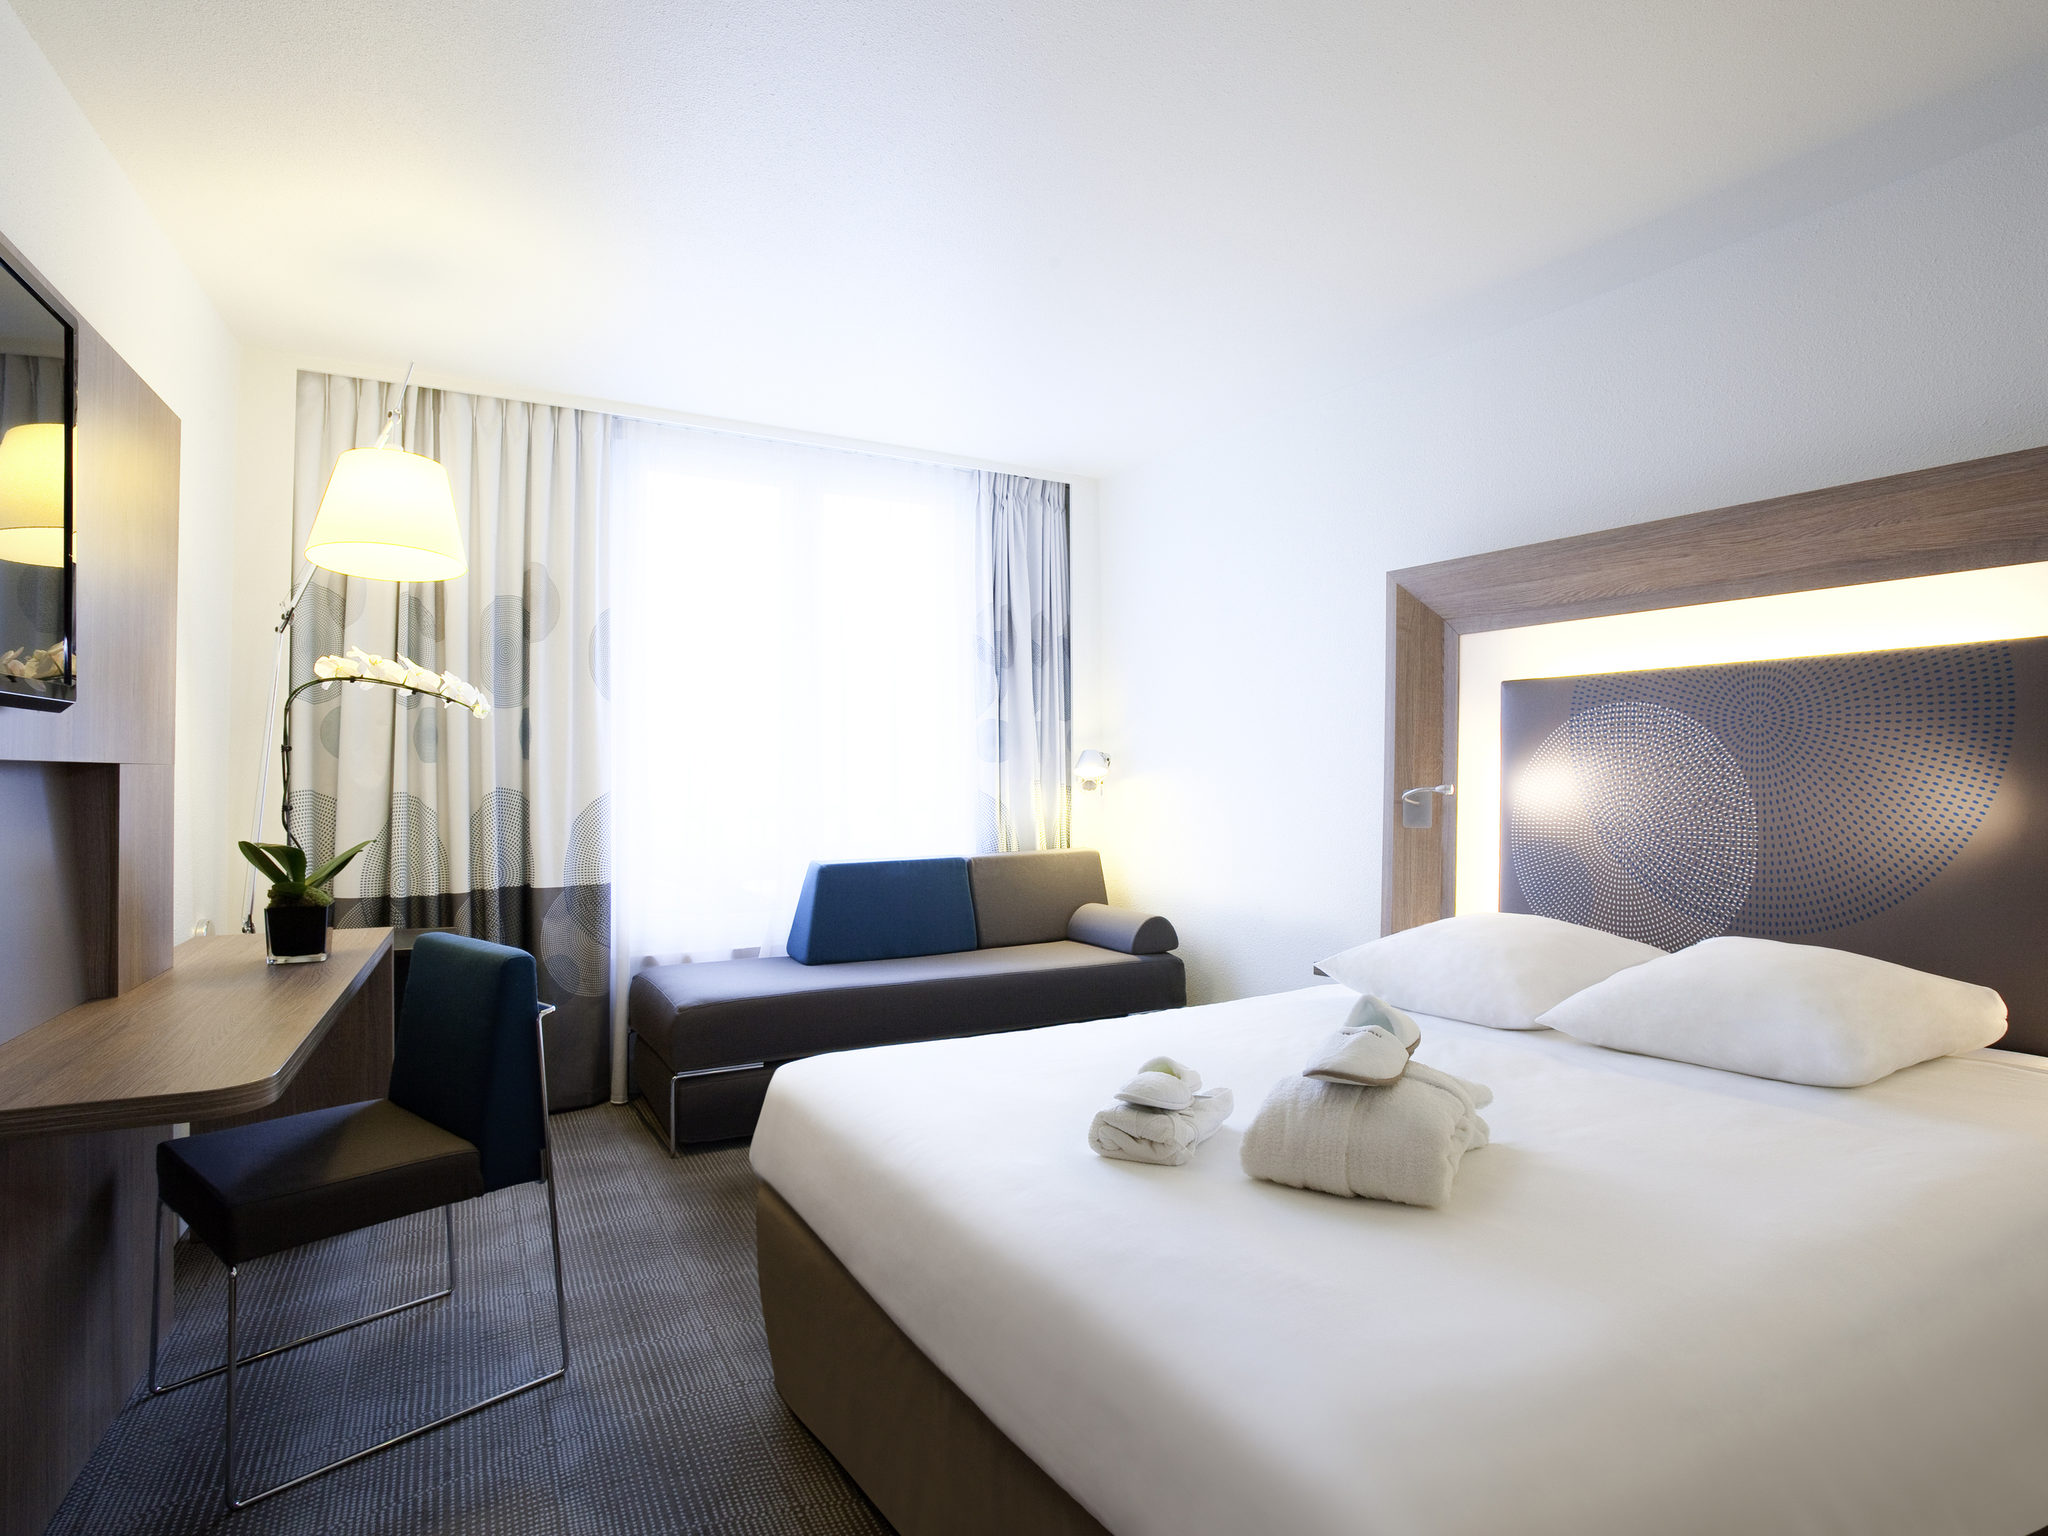 Hotel in paris novotel paris gare de lyon for Hotel im paris